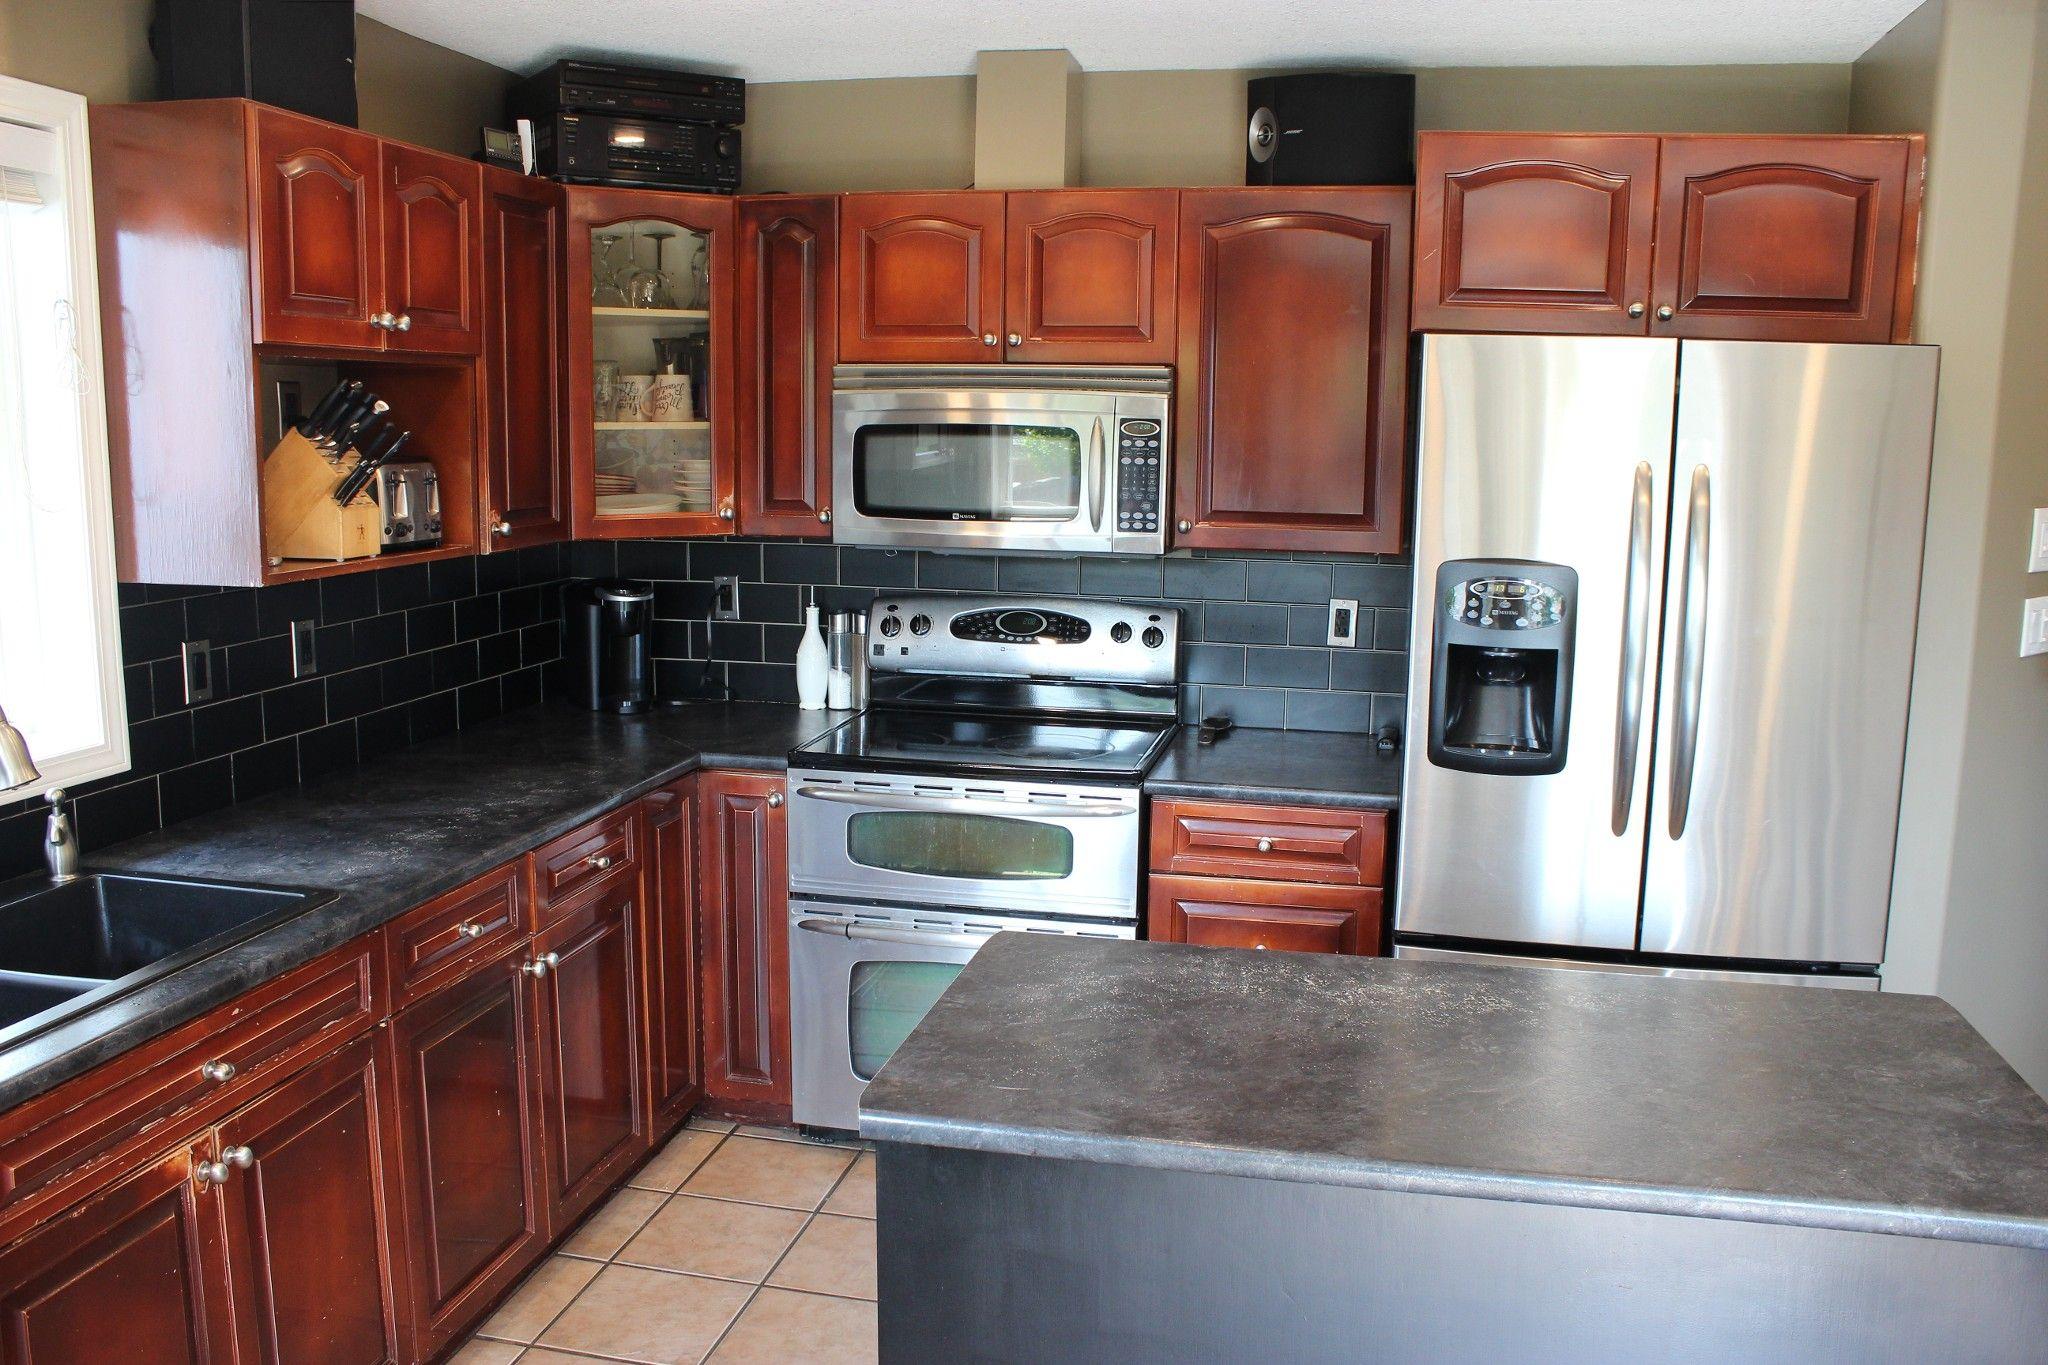 Photo 7: Photos: 729 McArthur Drive in Kamloops: Westsyde House for sale : MLS®# 151627